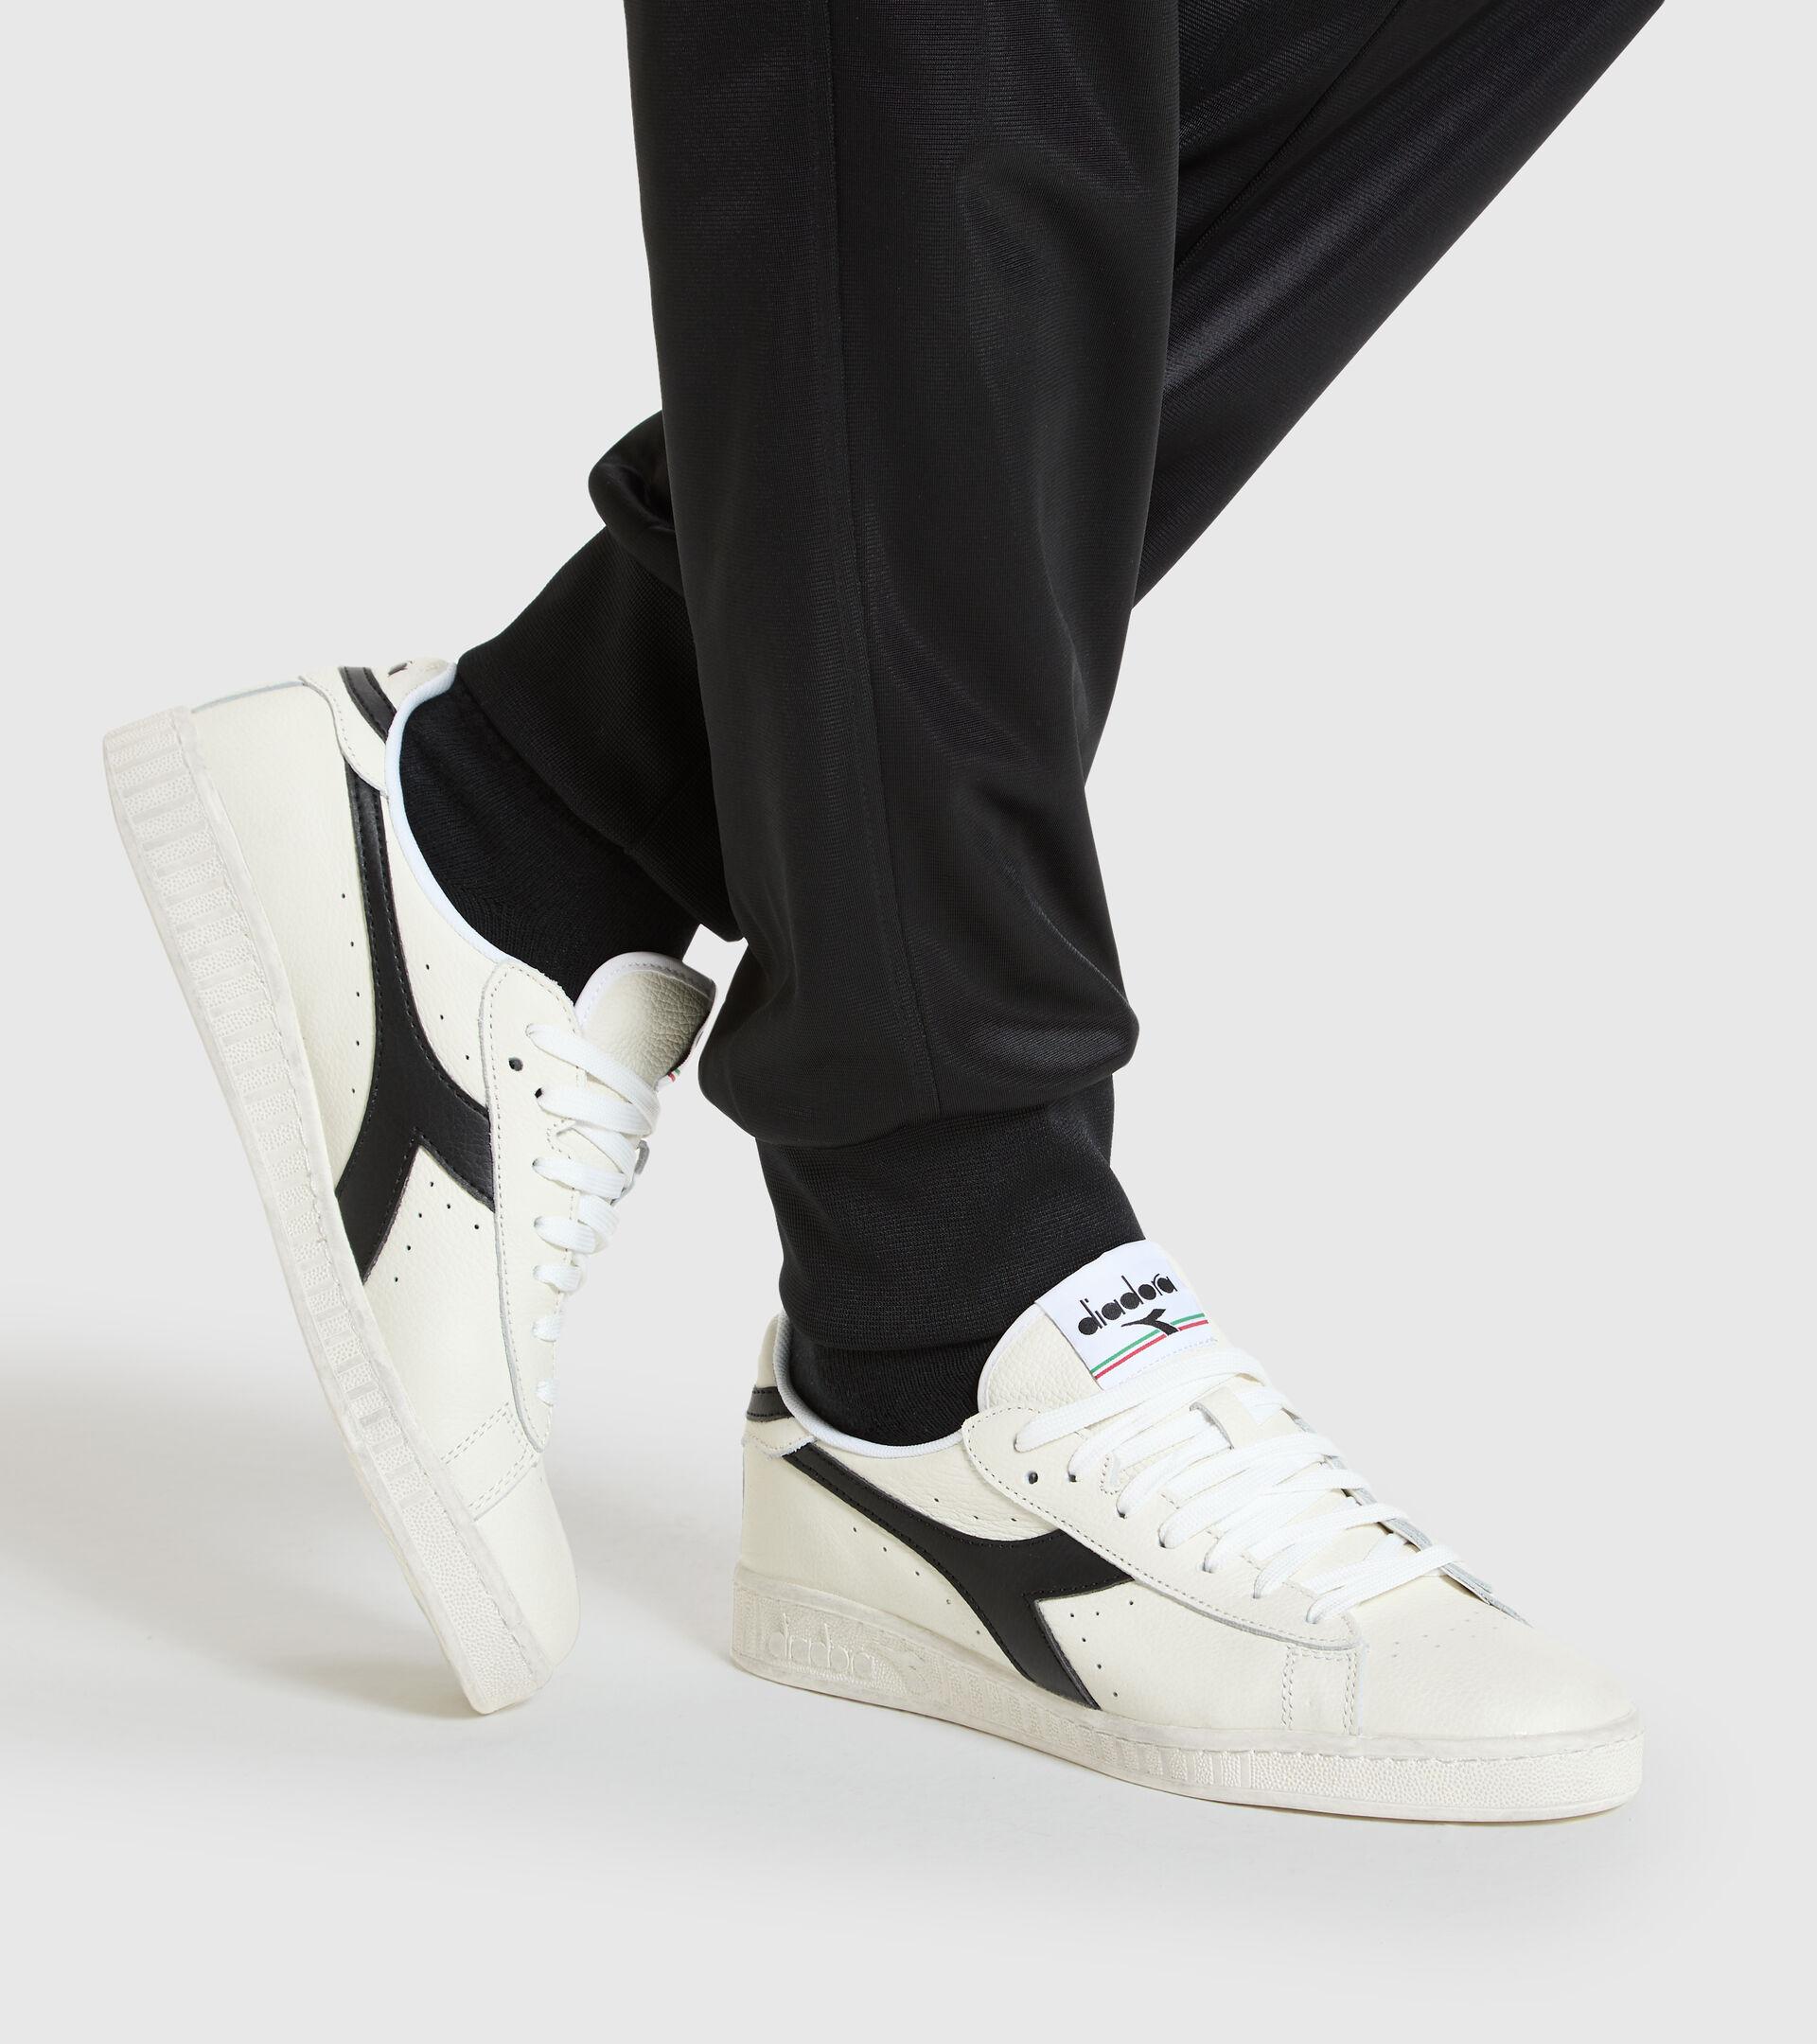 Trainer - Unisex GAME L LOW WAXED WHITE/BLACK - Diadora